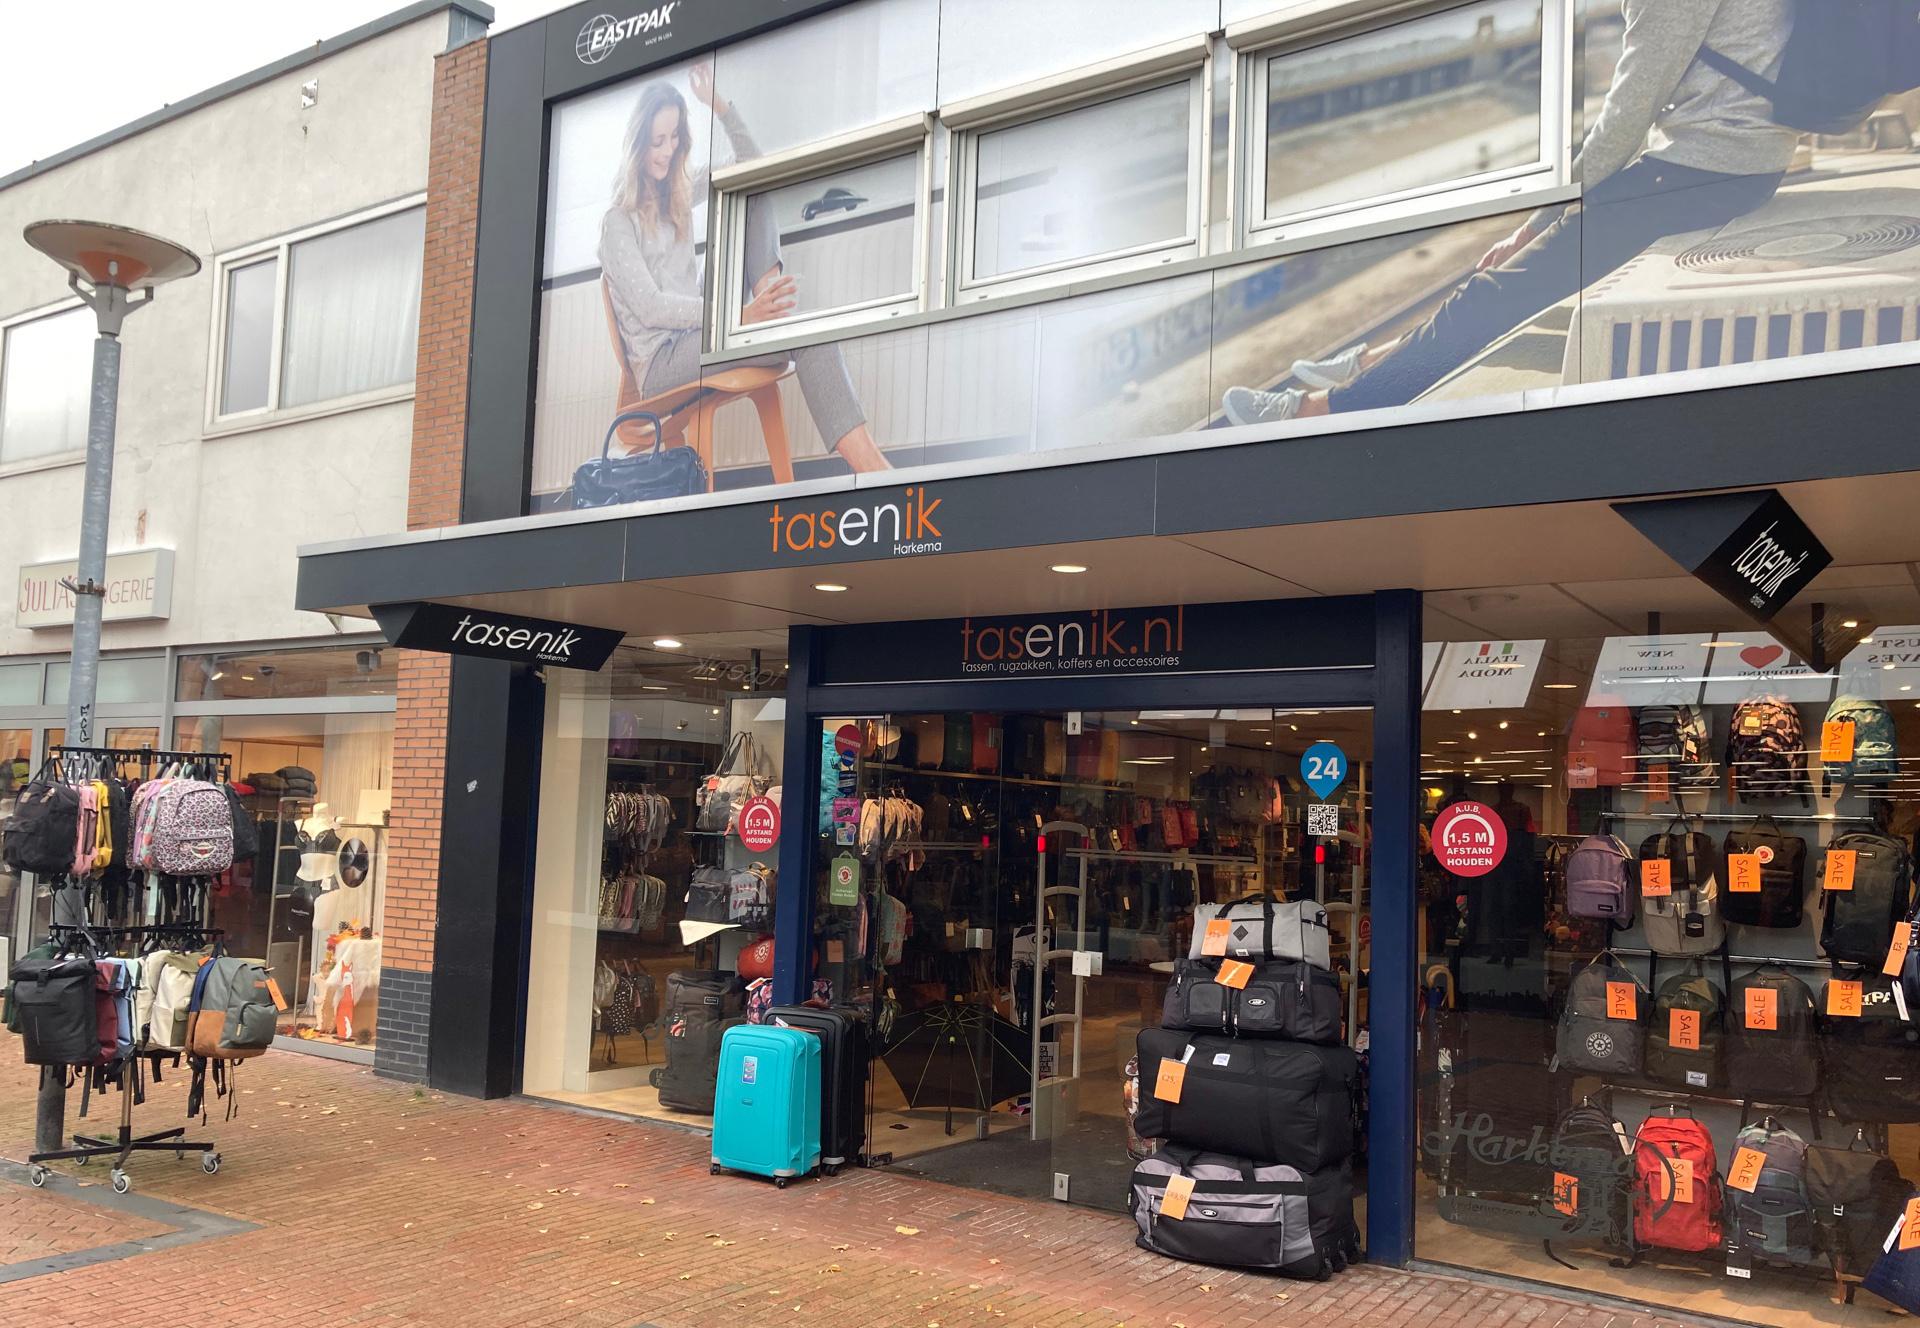 Harkema lederwaren in Winschoten│www.tasenik.nl